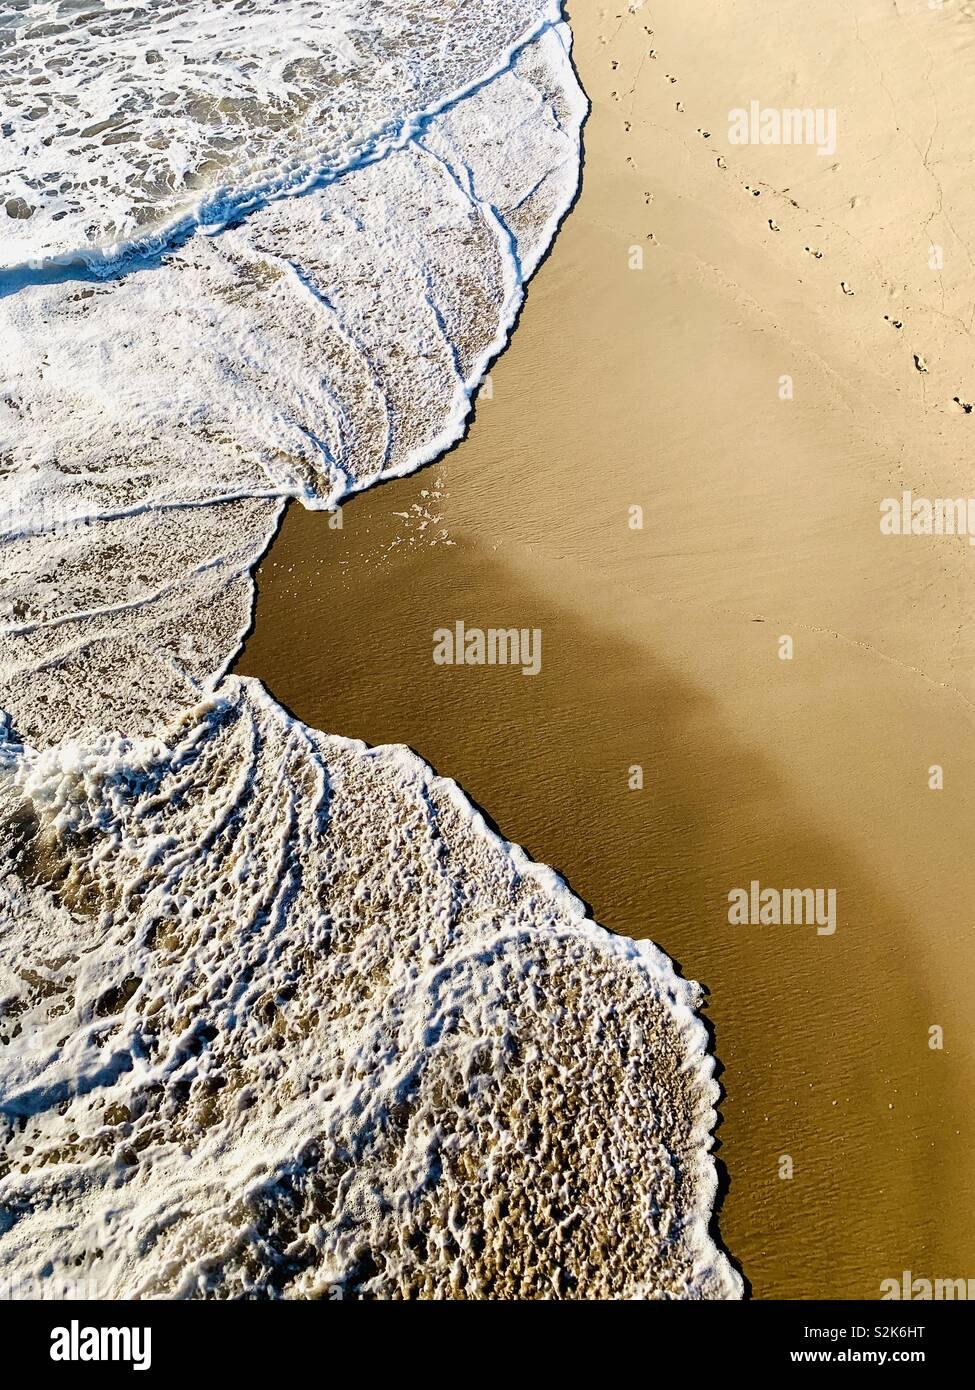 Footprints in the sand at the shoreline. Manhattan Beach, California USA - Stock Image